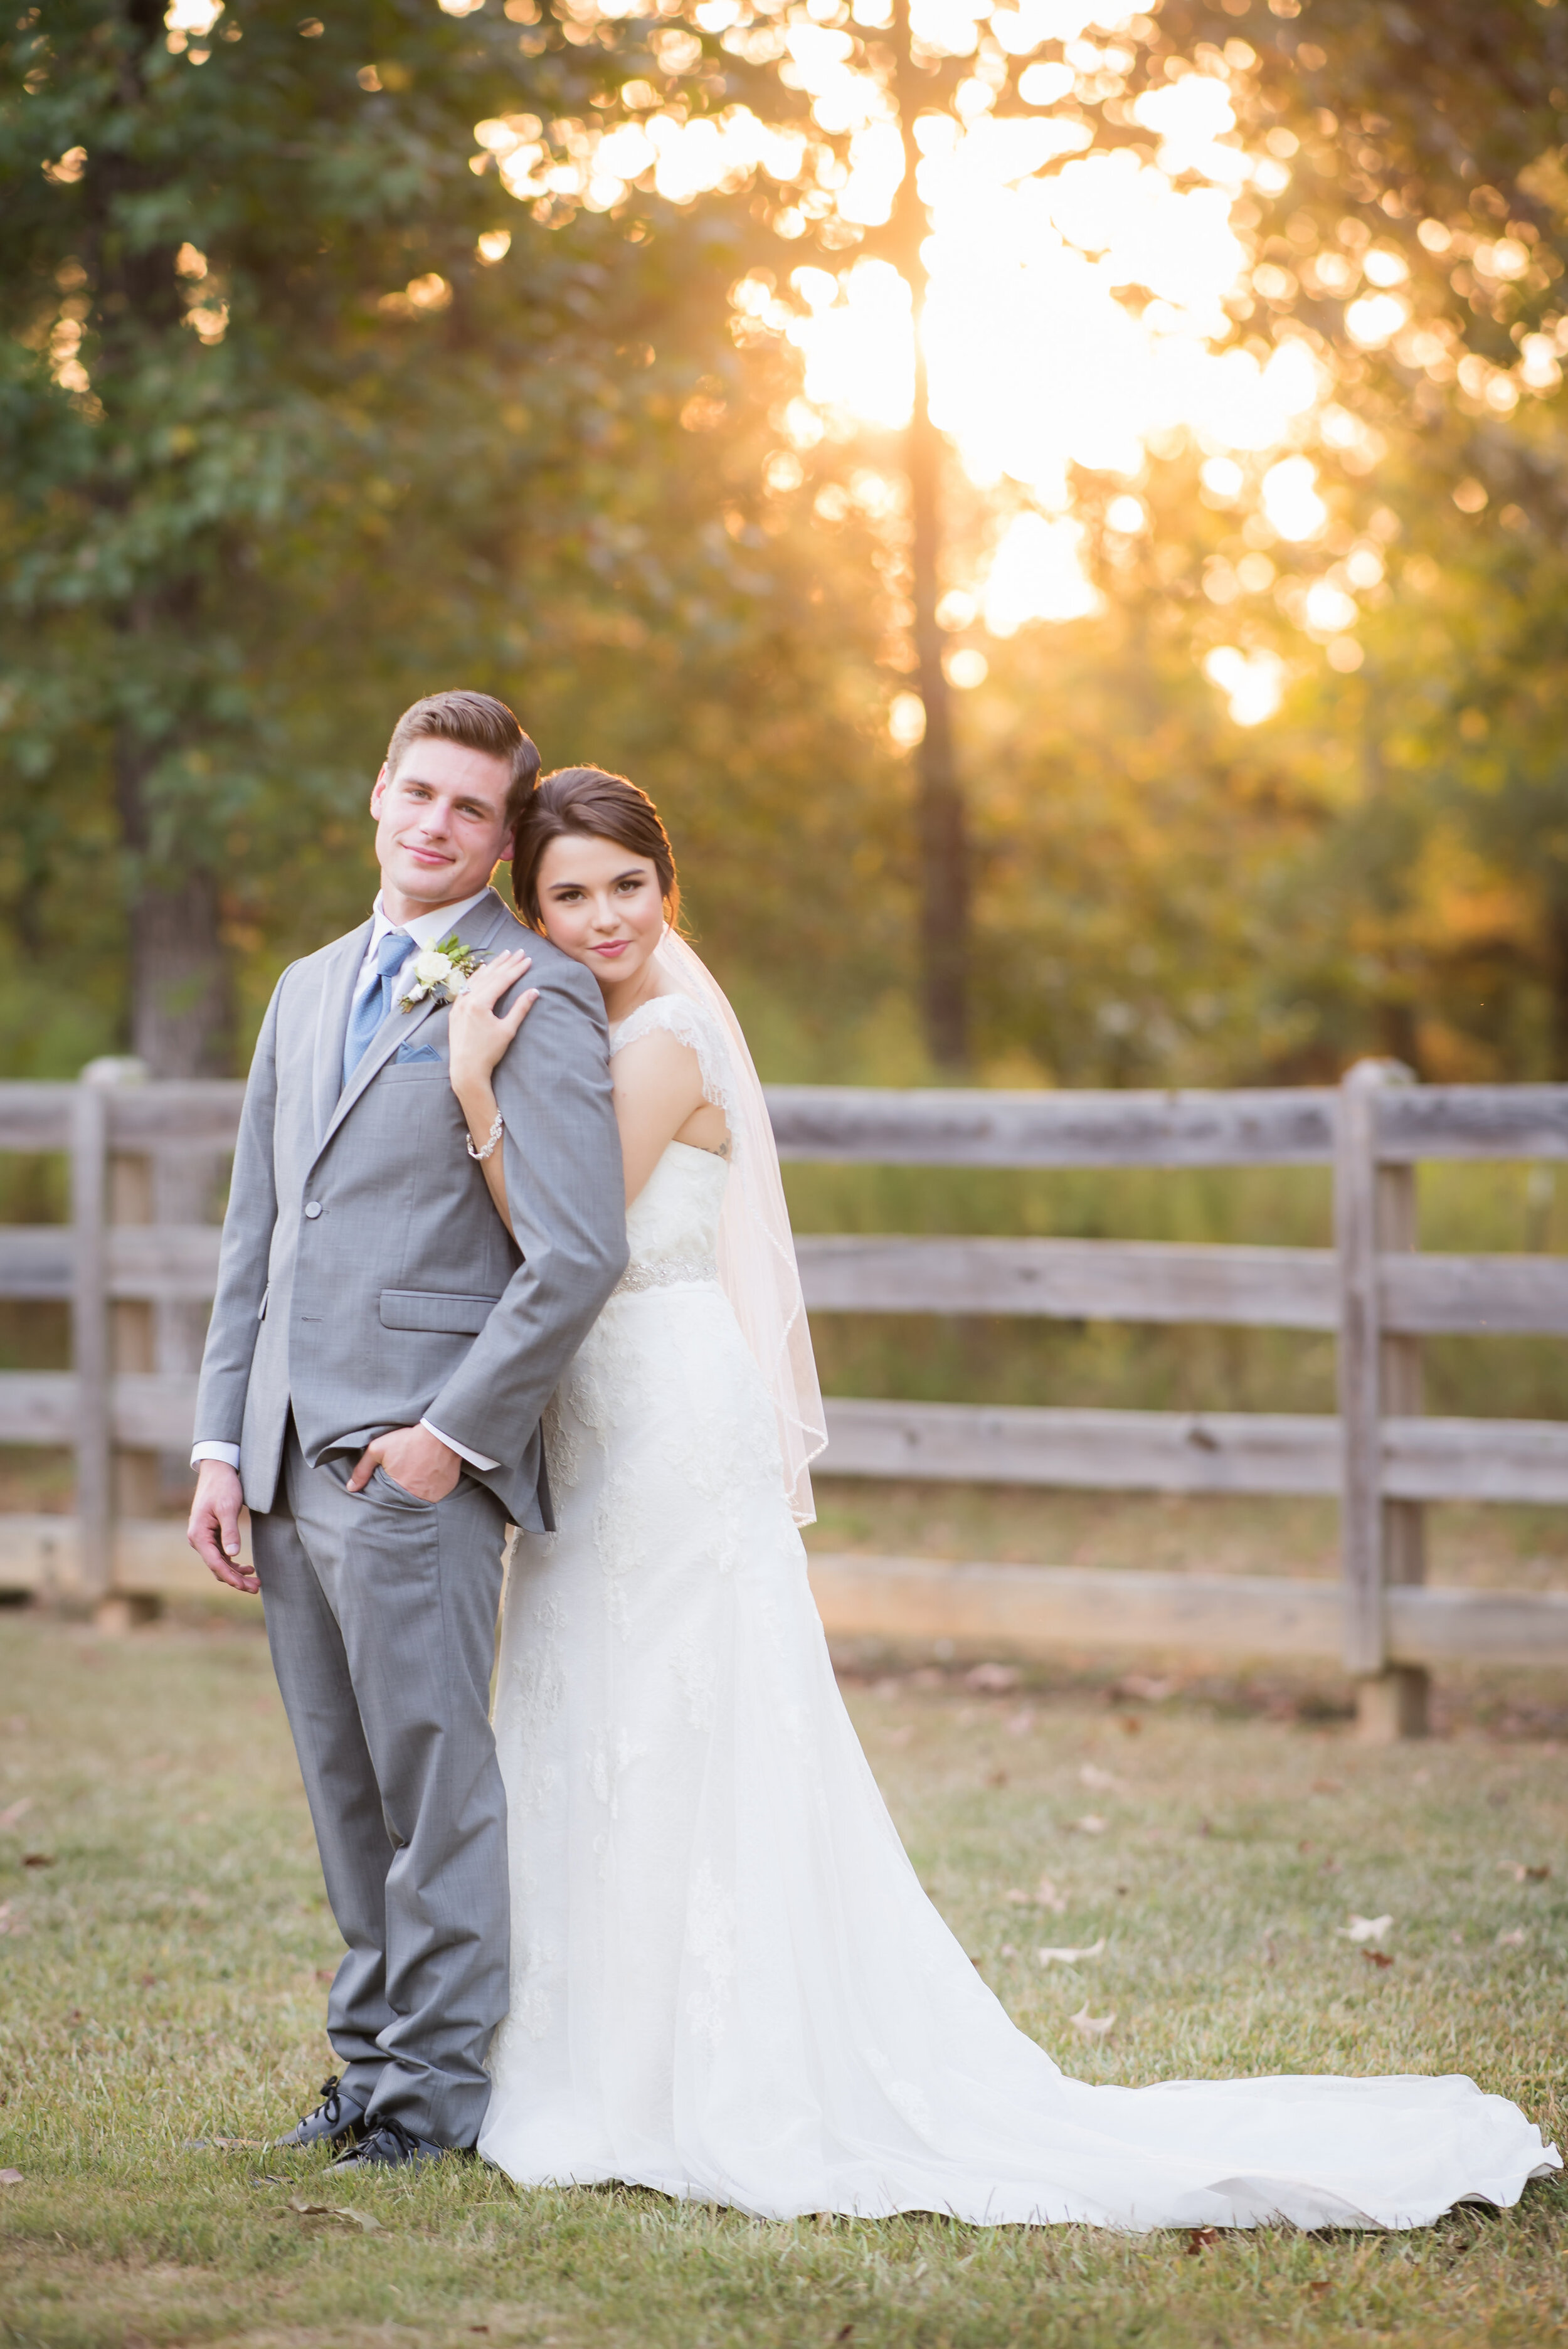 PHOTOGRAPHER: Adrea Thomas Photography -- www.adreathomas.com -- IG: adreathomasphoto  EVENT DESIGN & FLOWERS: Your Best Guest -- Hannah Guest -- www.yourbestguest.com -- IG & FB: @yourbestguest  MODELS: Julia —IG: julesblairr & Logan — IG: lmostby